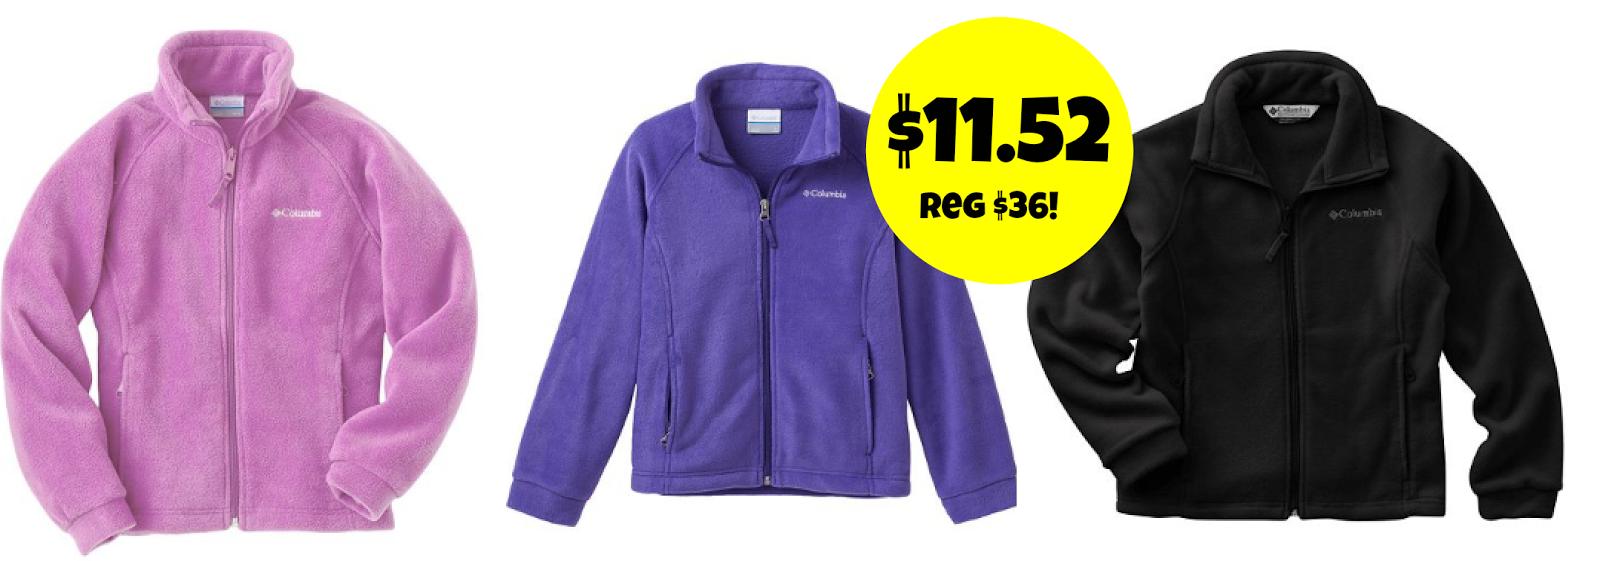 http://www.thebinderladies.com/2014/11/kohls-com-girls-columbia-sportswear.html